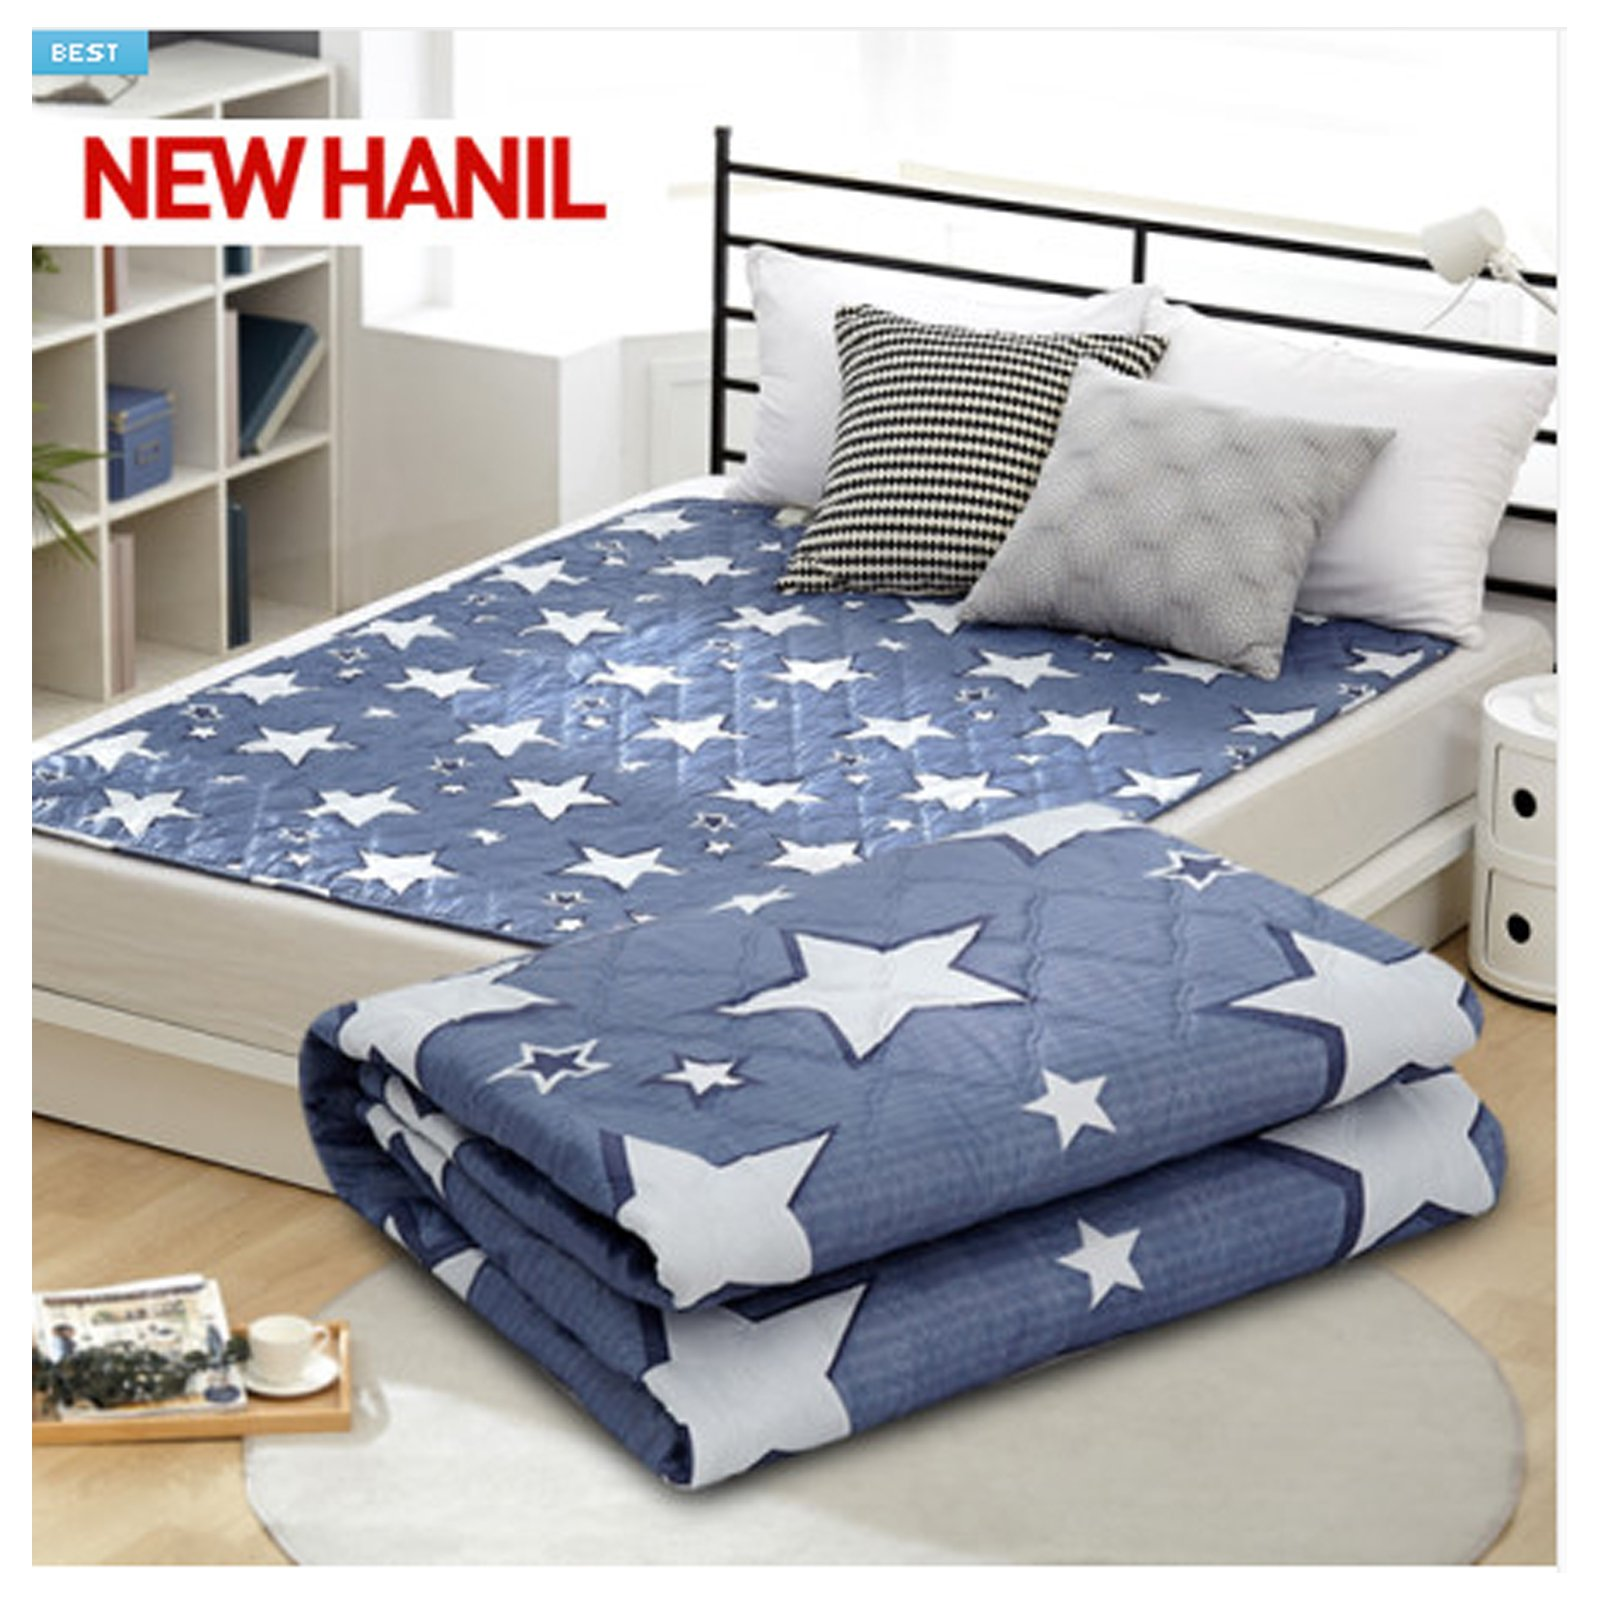 NEW HanIl Electric Heated Mat Warm Sheet Washable Heating Pad 220V (Double, Big Star_Blue)